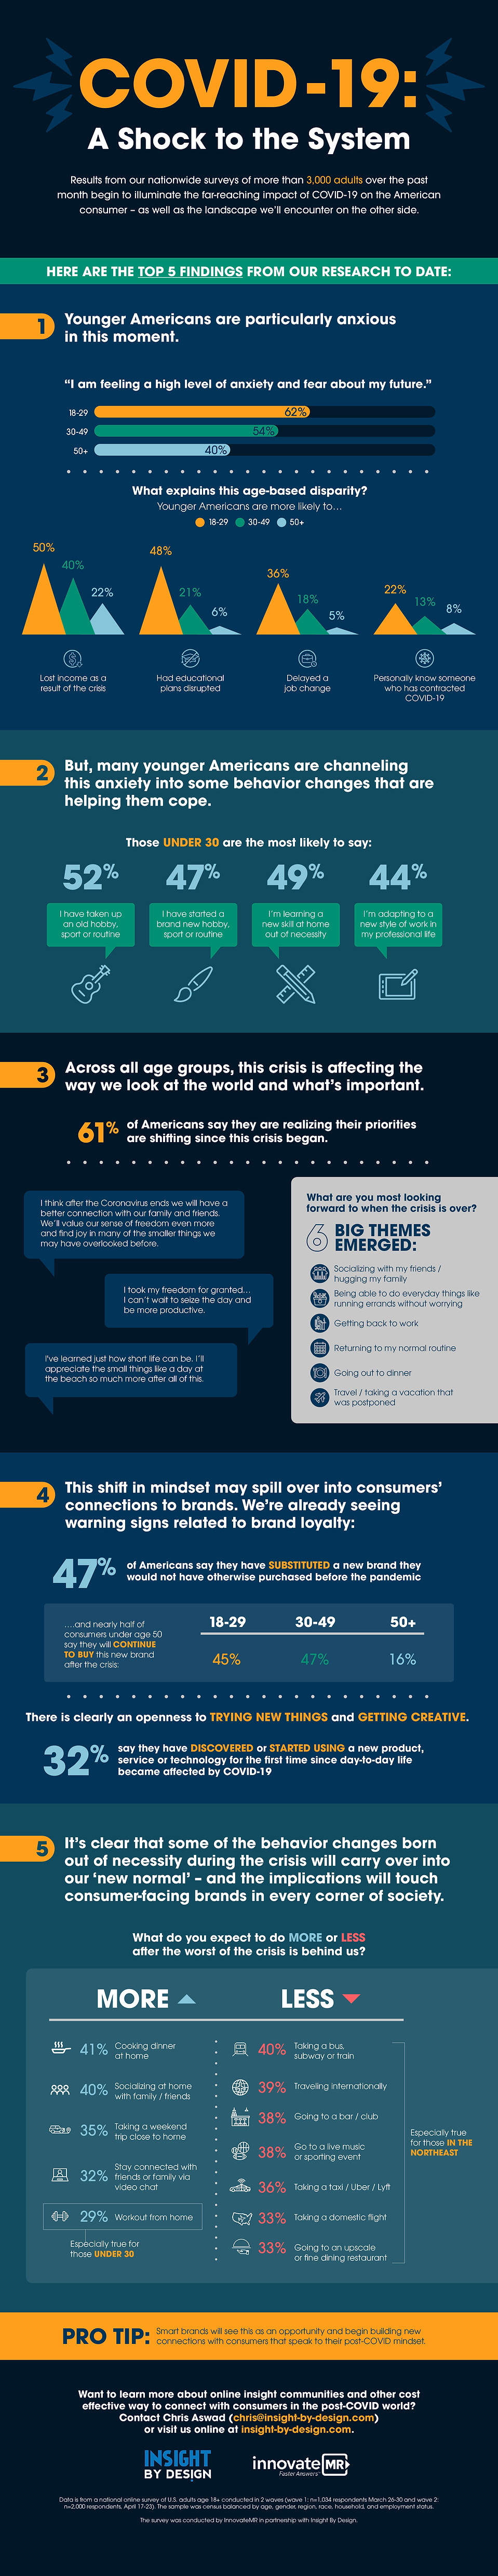 COVID 19 Consumer Insights